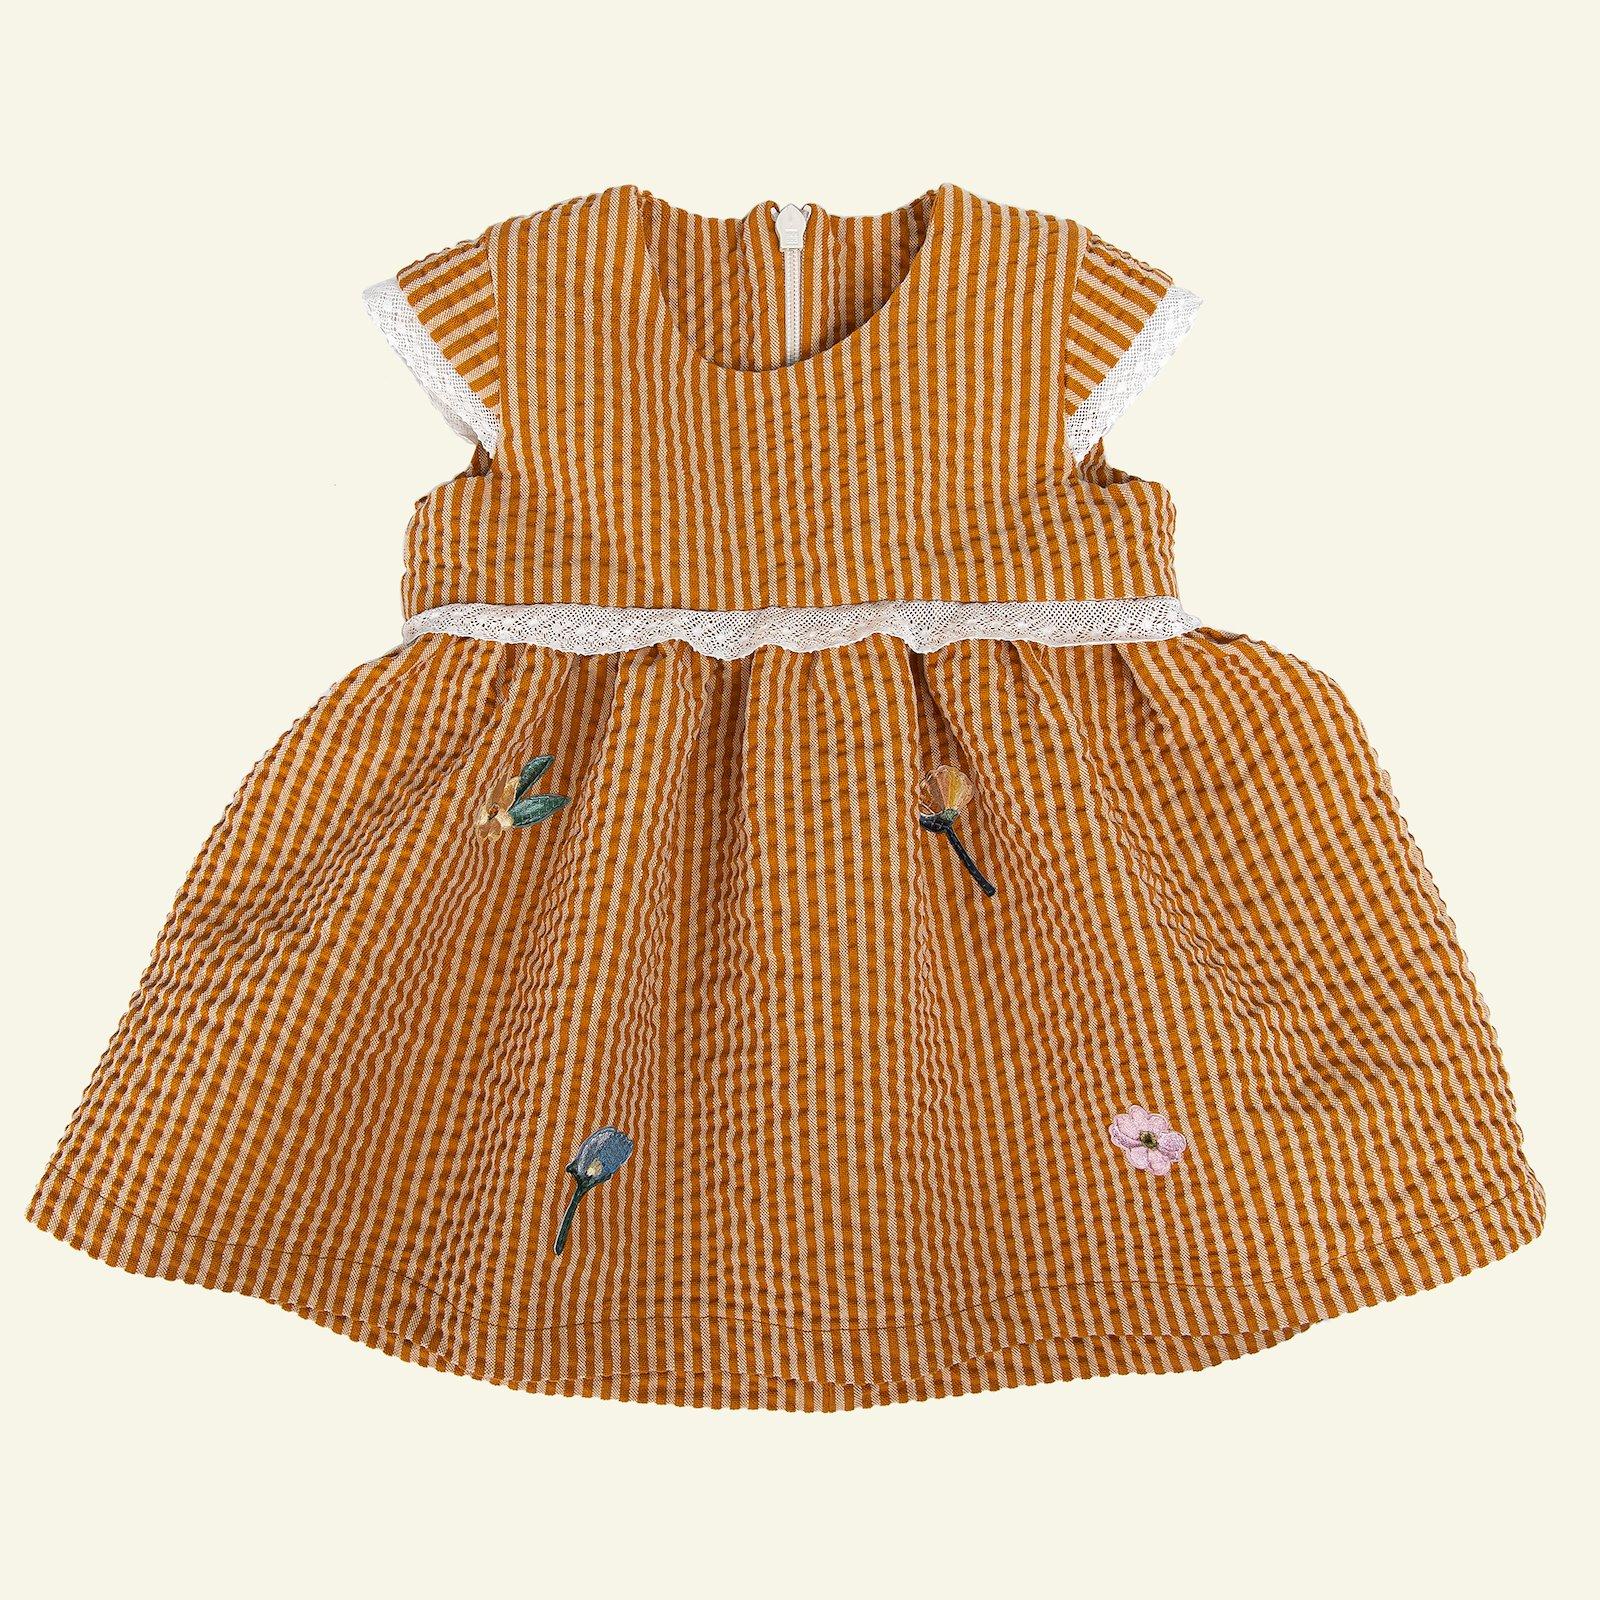 Dress, 86/1,5y p83014_510955_25130_26468_sskit